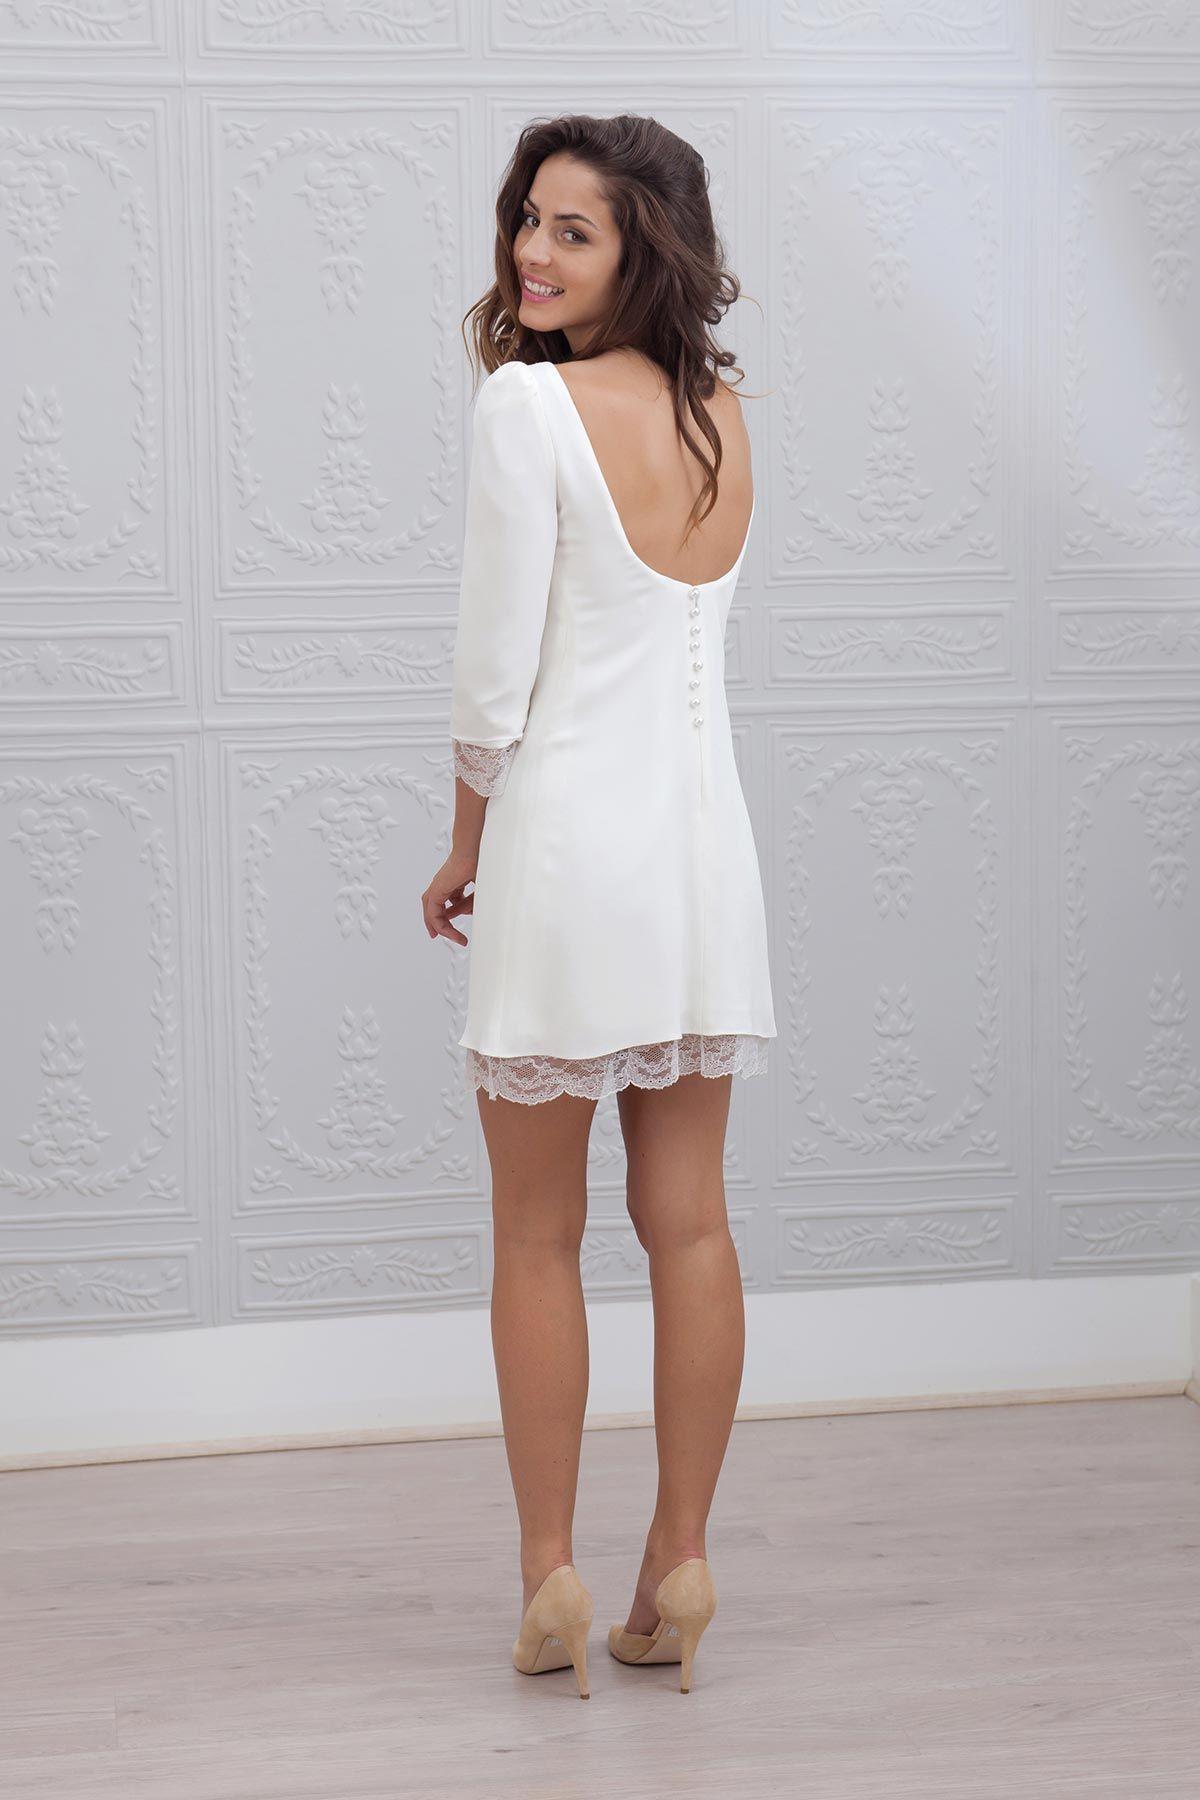 20 robes de mari e courtes de cr ateurs wedding robe. Black Bedroom Furniture Sets. Home Design Ideas